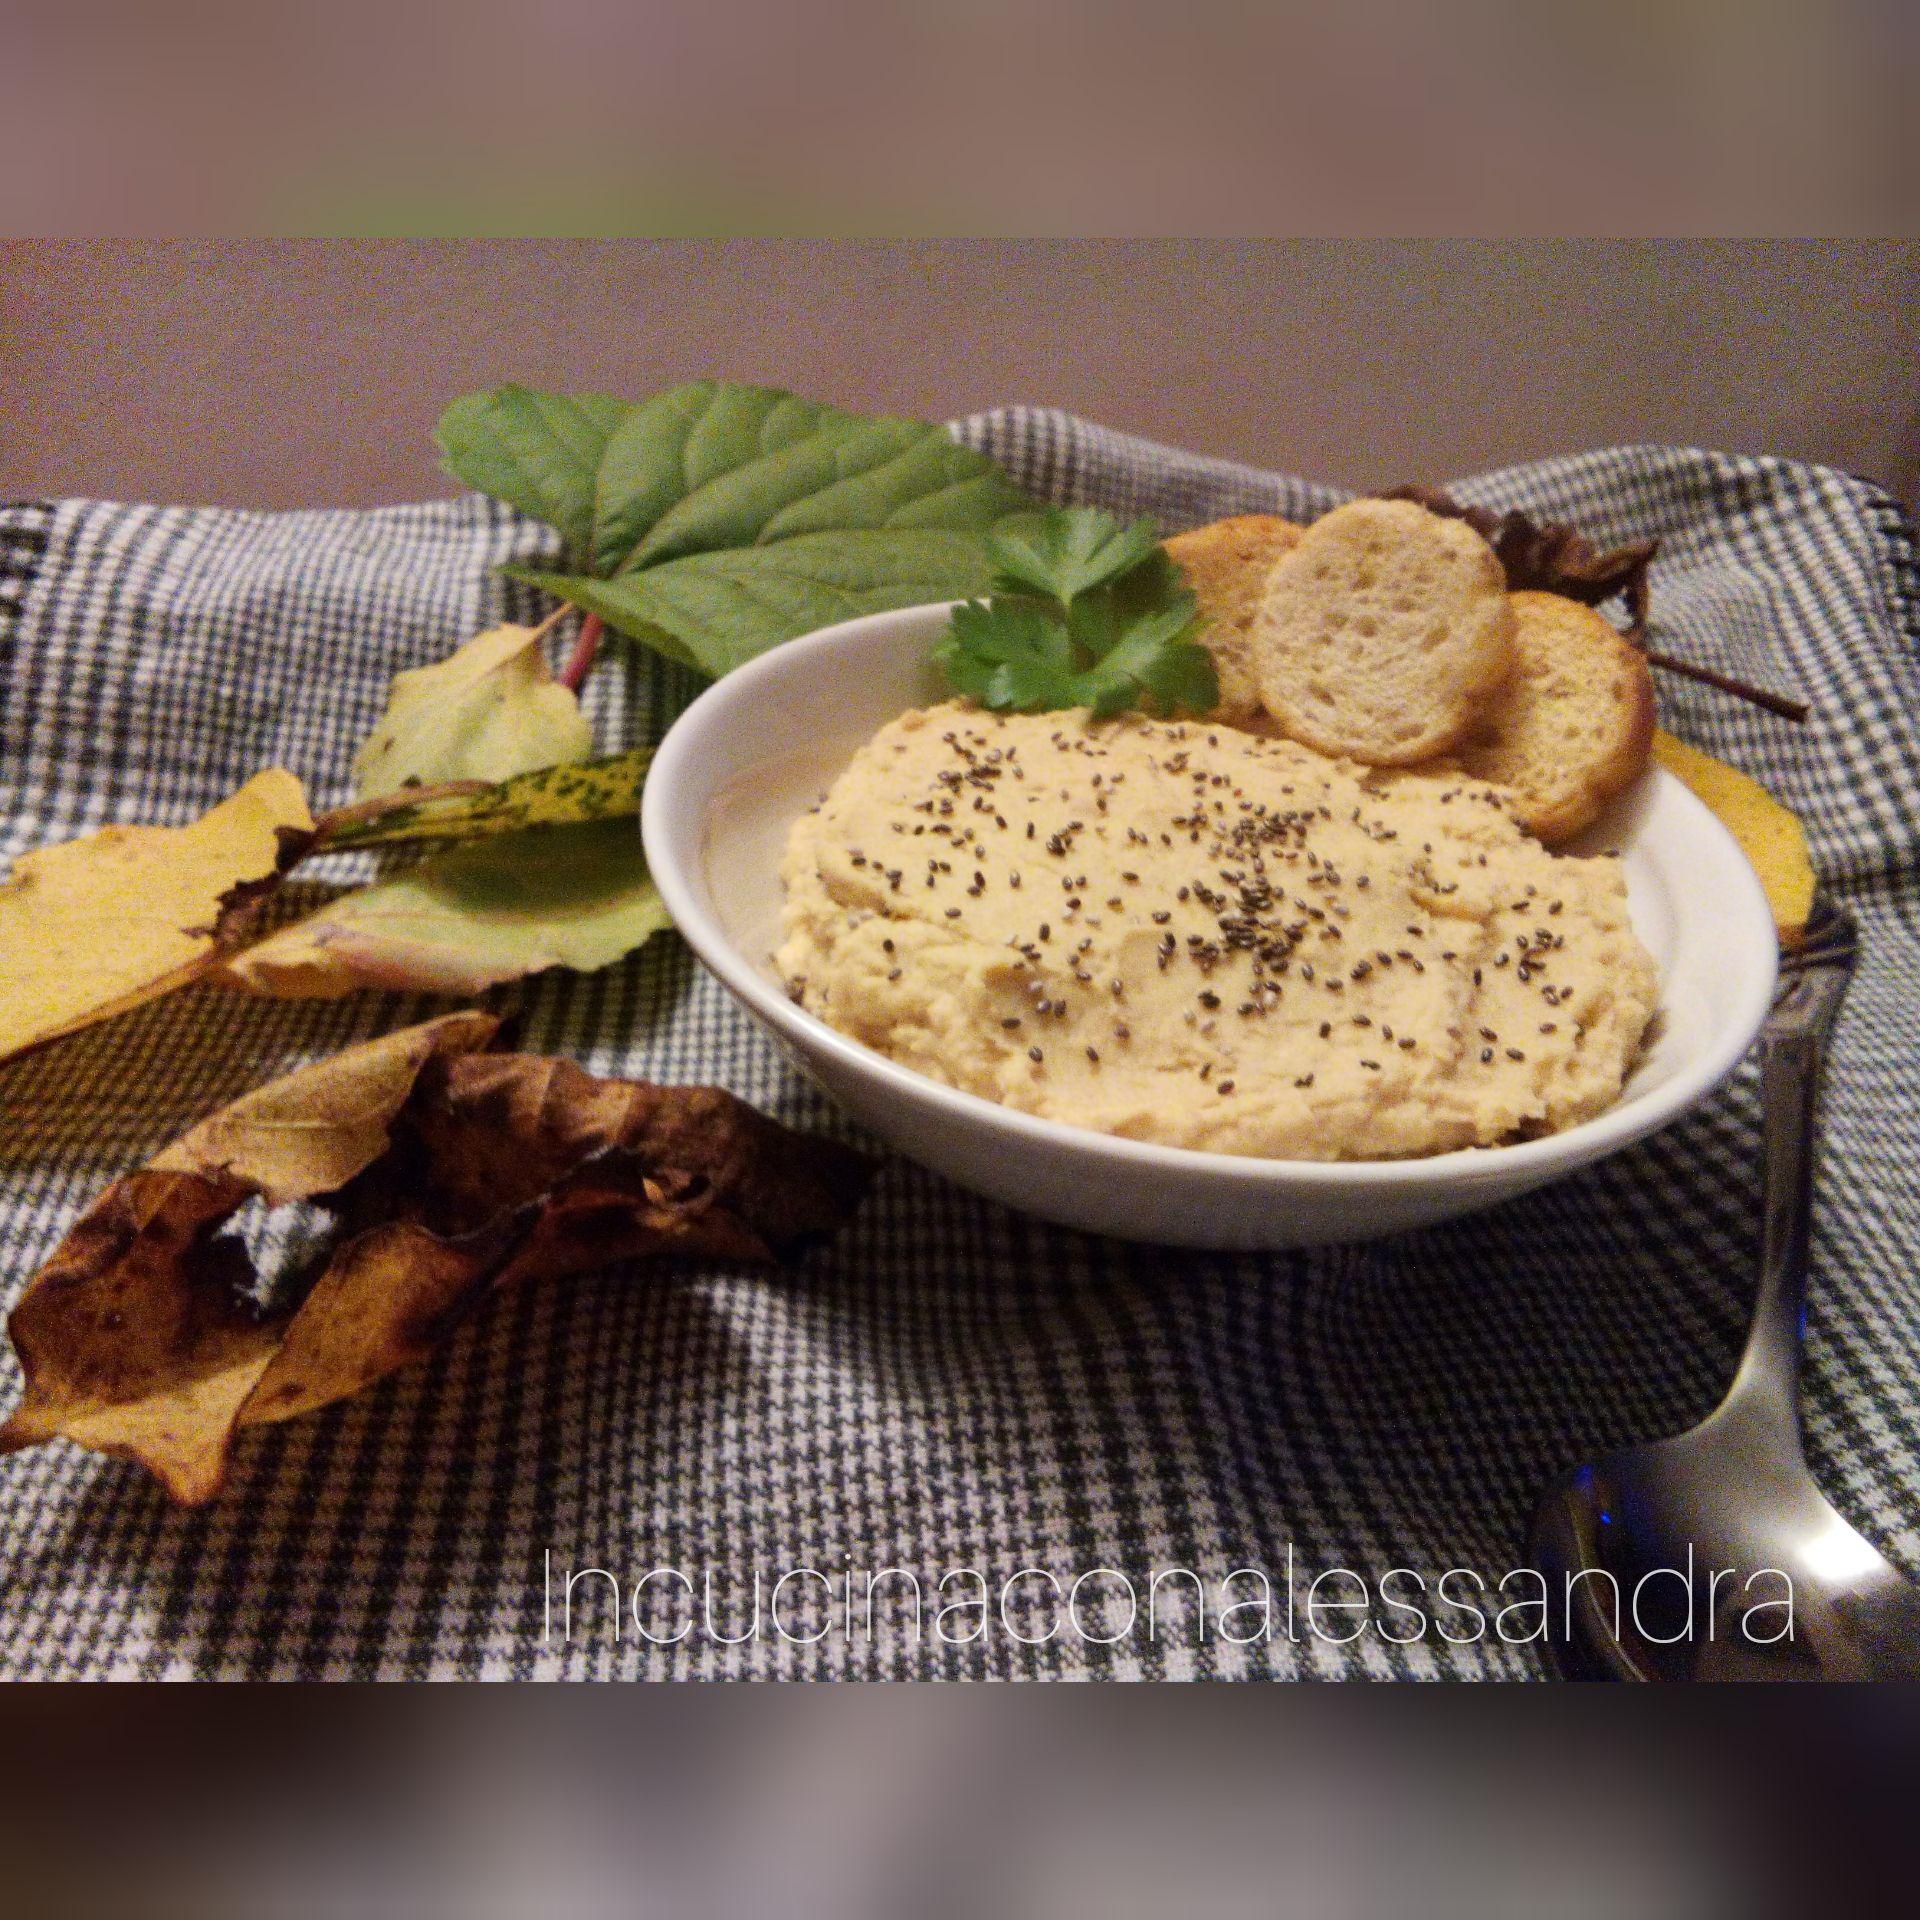 Hummus Ricetta Semplice Senza Tahina.Hummus Di Ceci Con Semi Di Chia Senza Tahina Incucinaconalessandra Ricetta Ricette Hummus Idee Alimentari